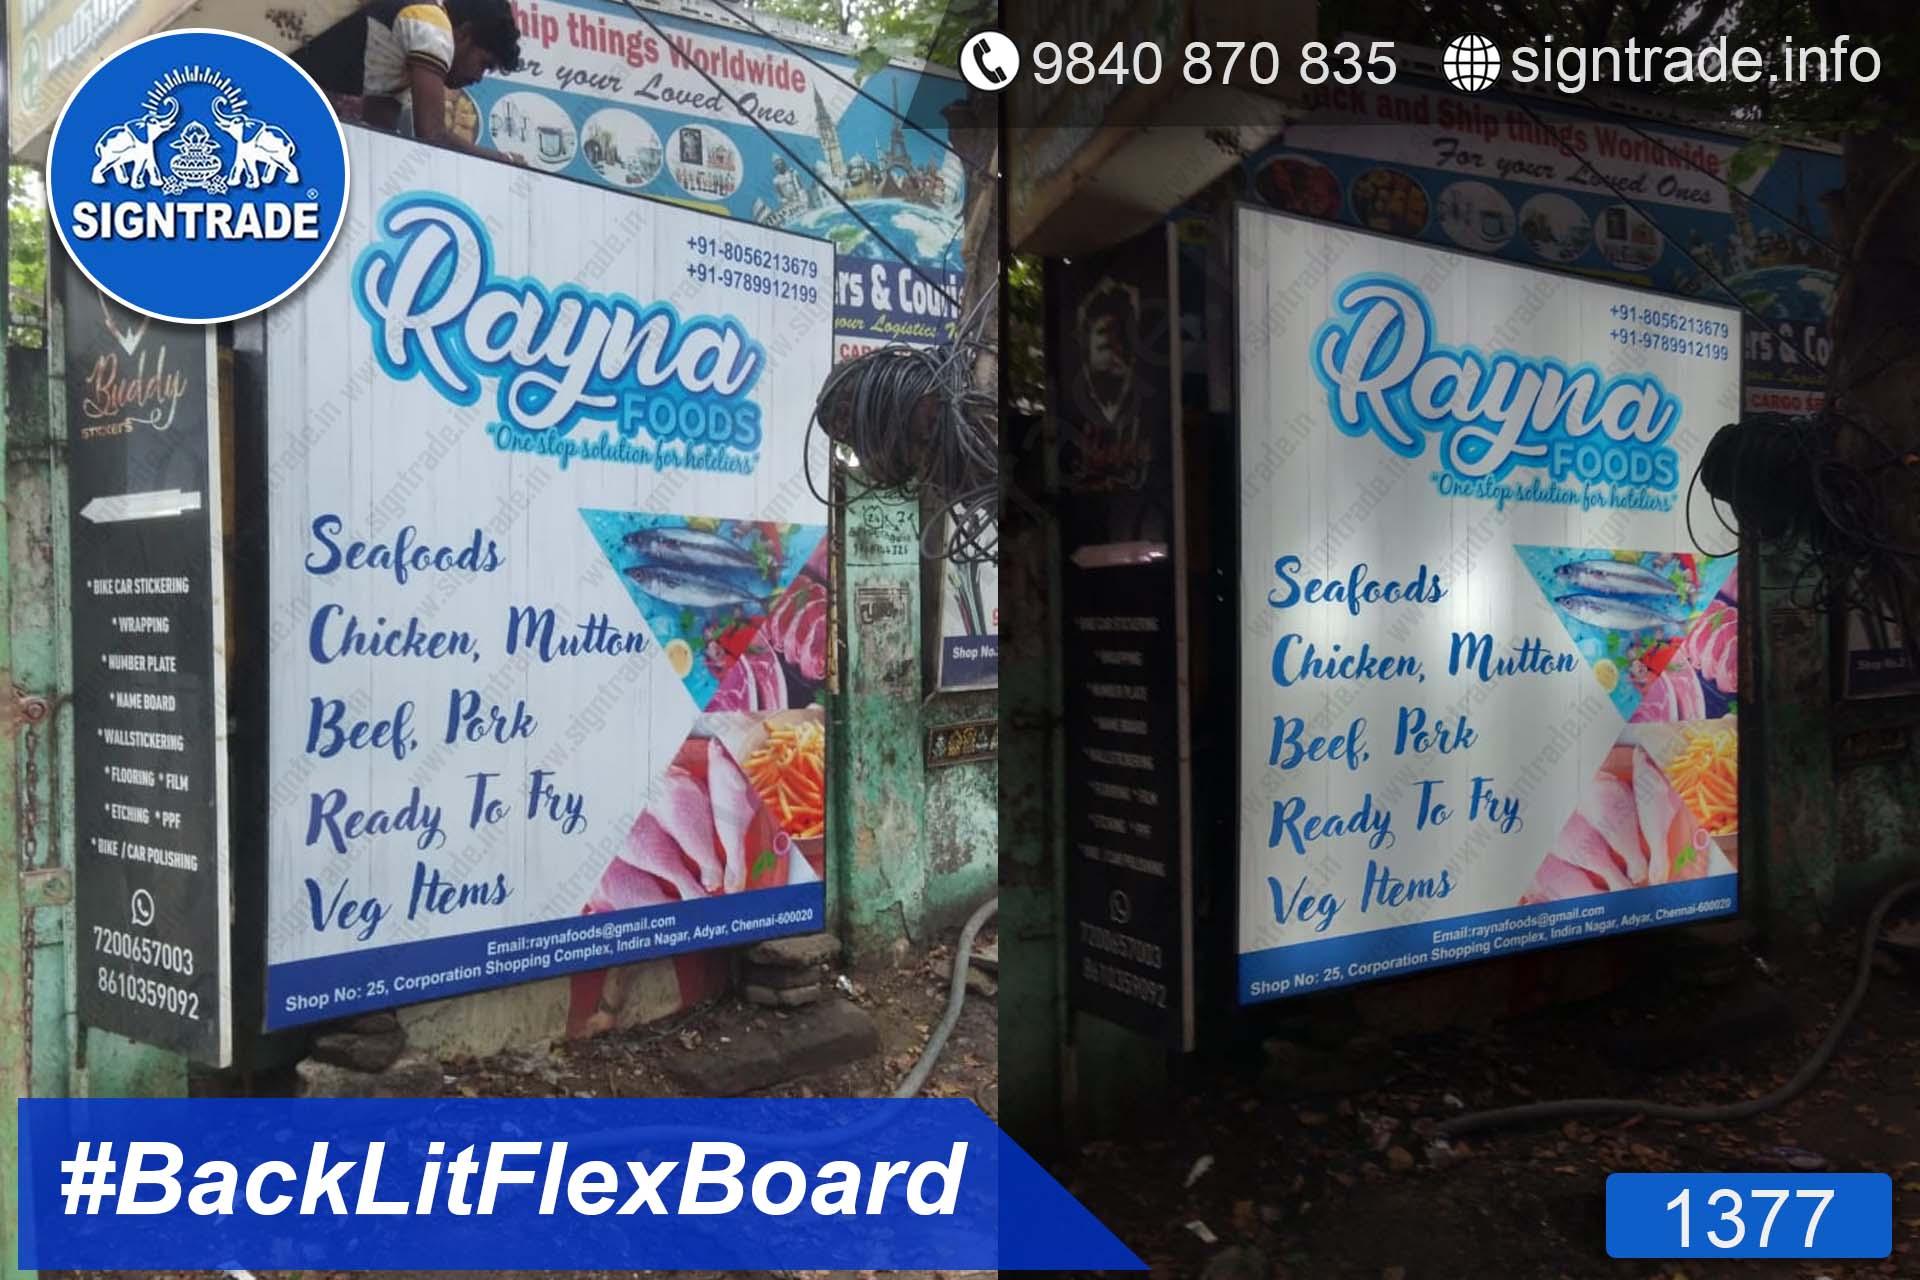 Rayna Foods - Chennai - SIGNTRADE - Backlit Flex Board - Digital Printing Services in Chennai